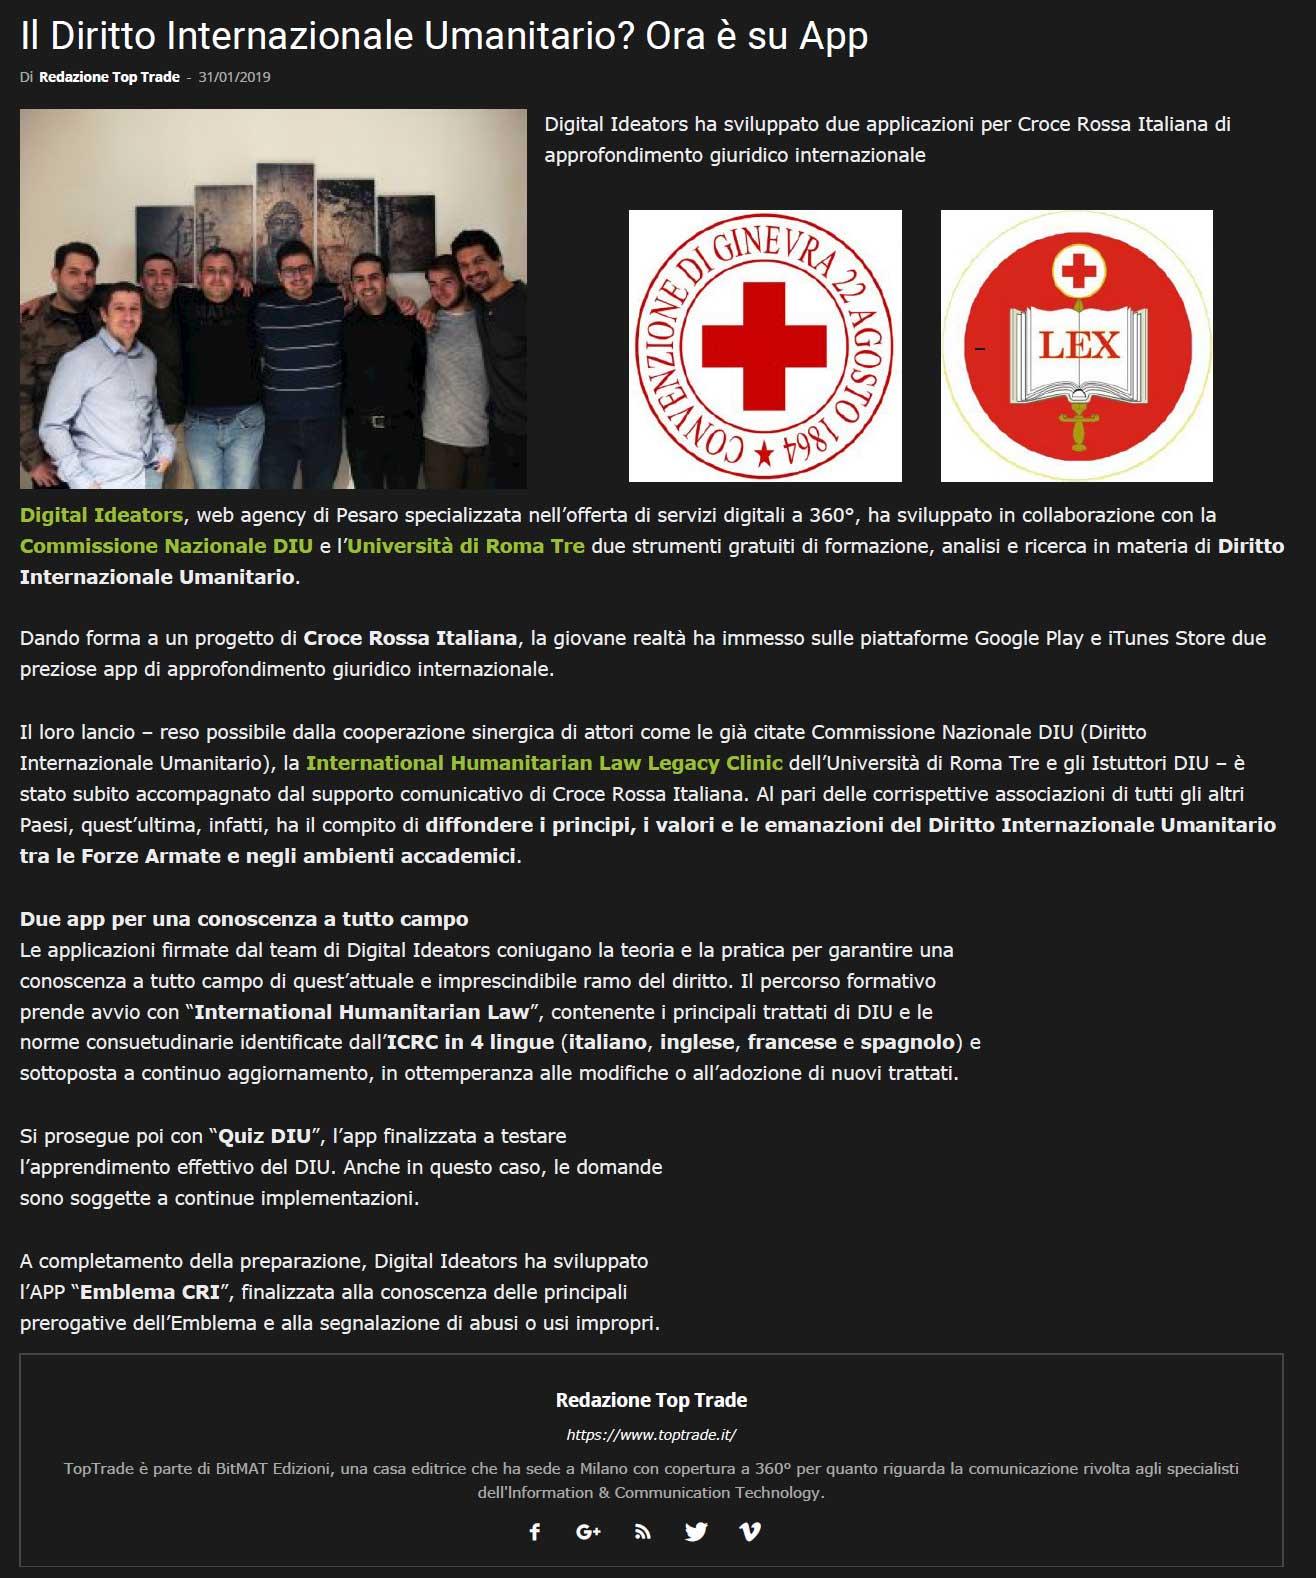 20190131-Top-Trade-31-Gennaio-2019-App-Croce-Rossa-Italiana.jpg